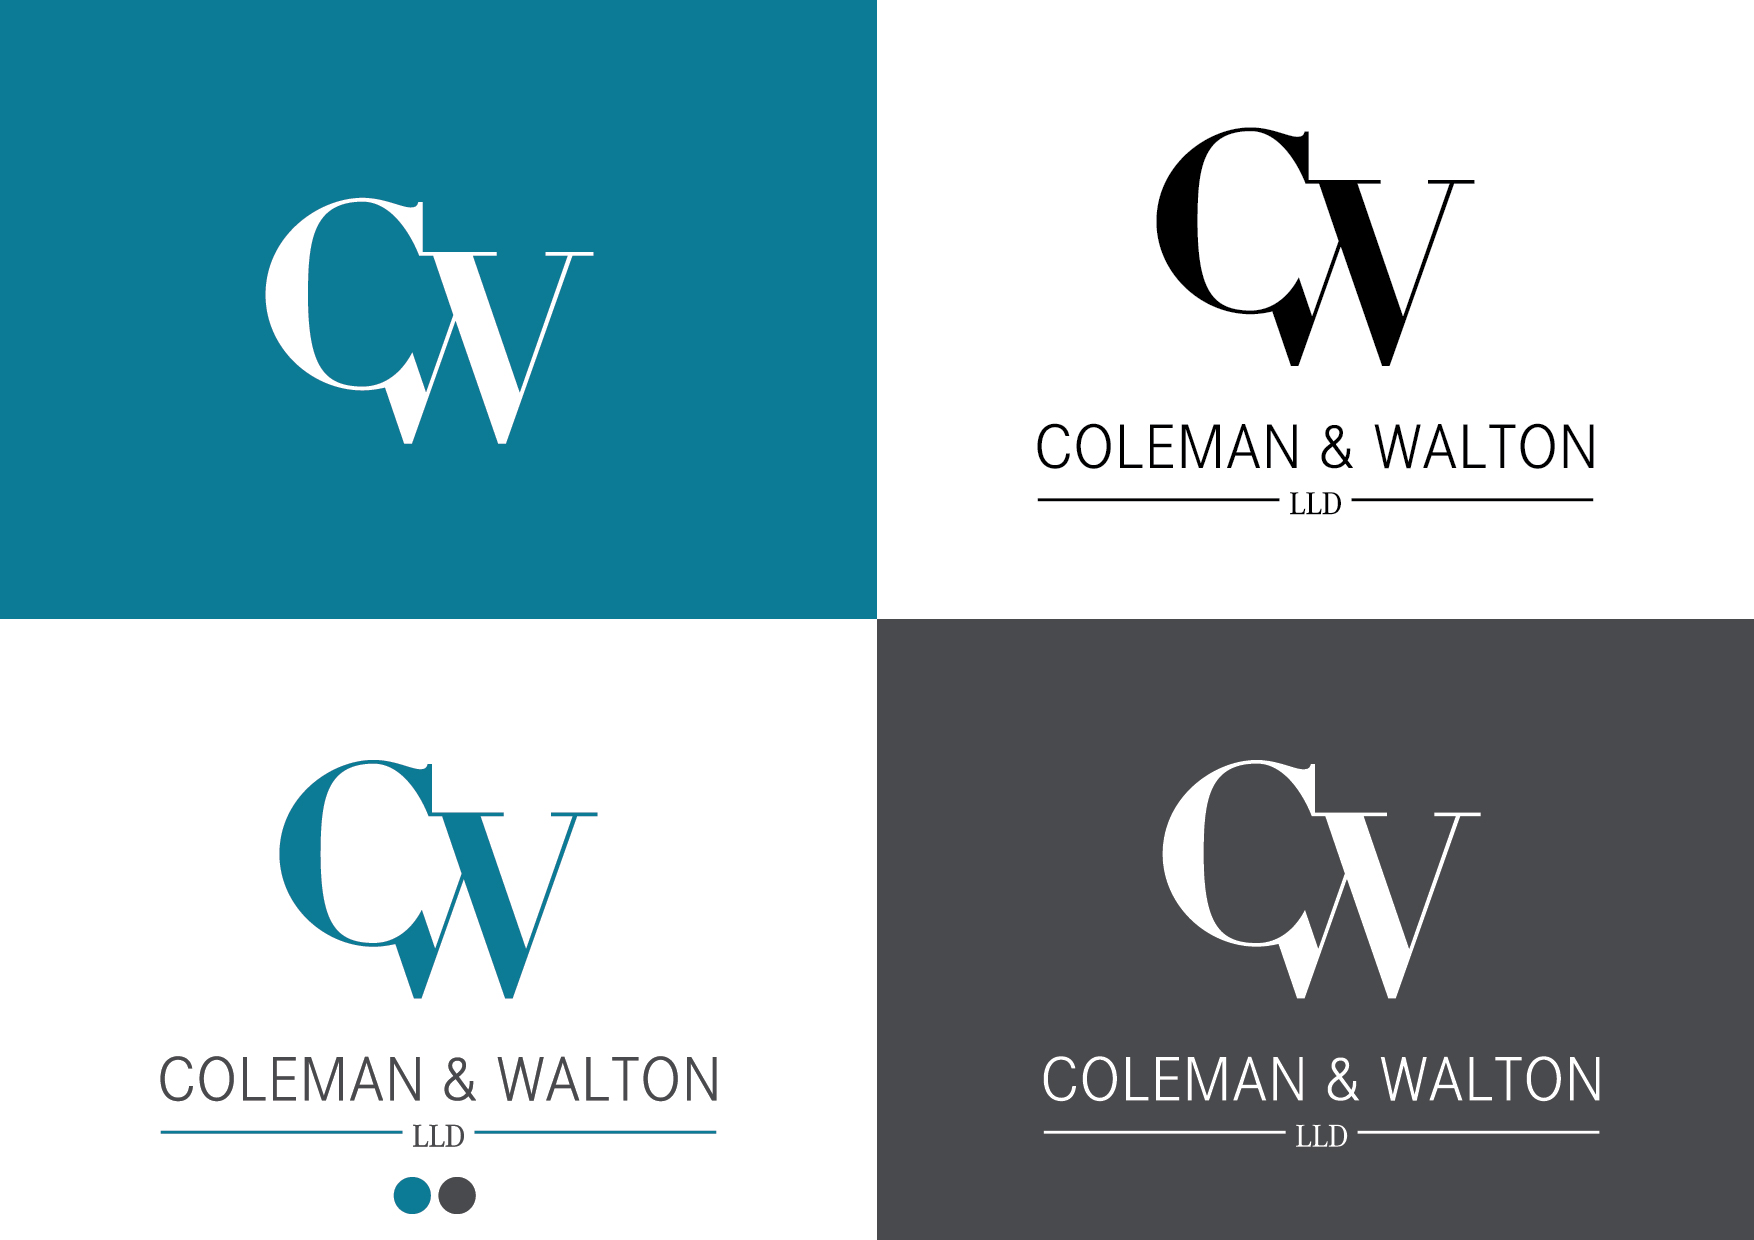 Cw_logo-02